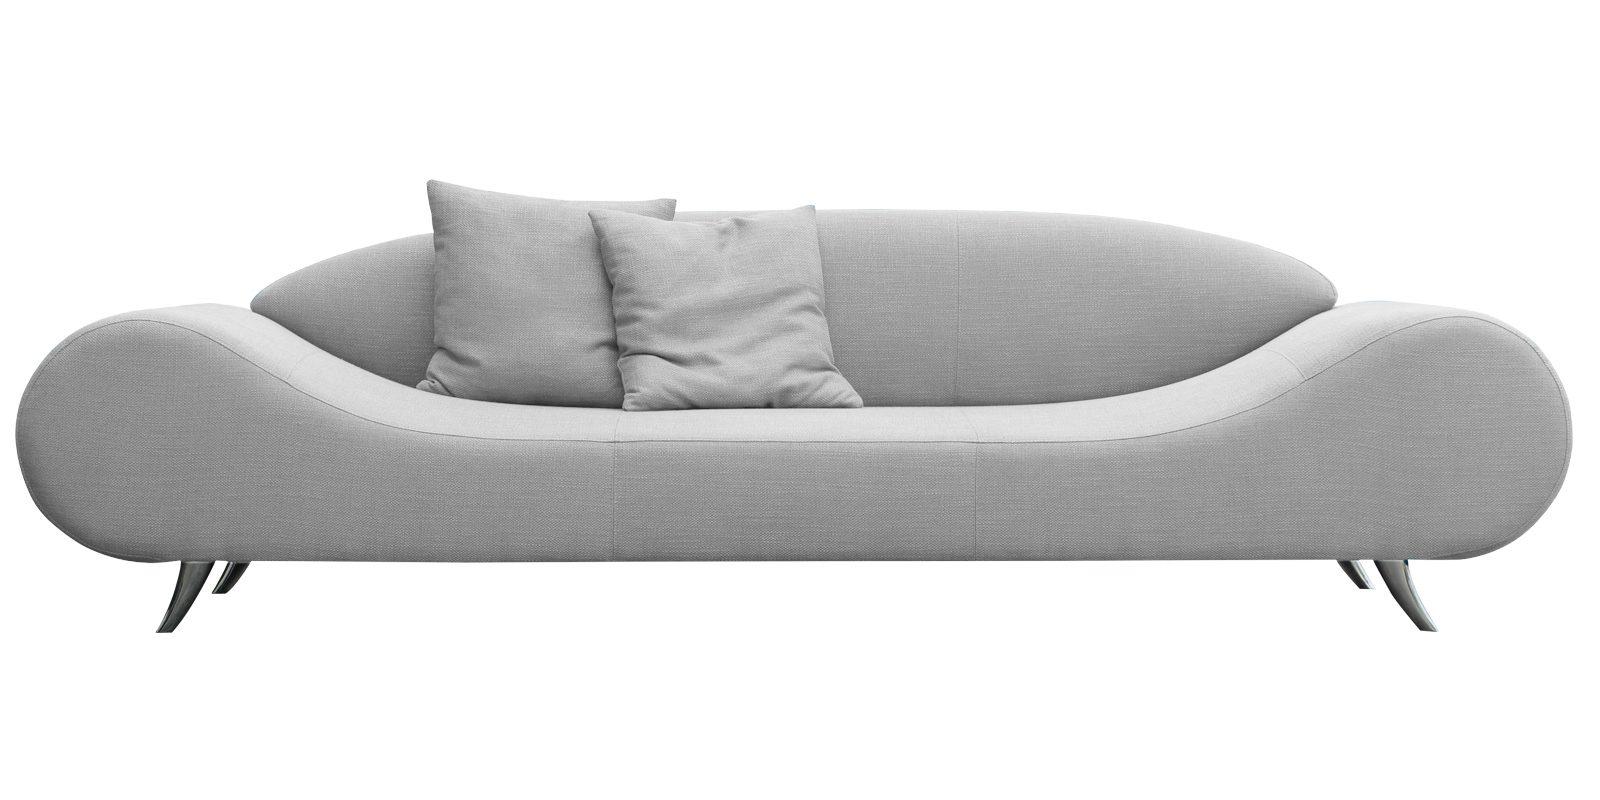 Astonishing Three Seater Sofa Dreamzz Furniture Online